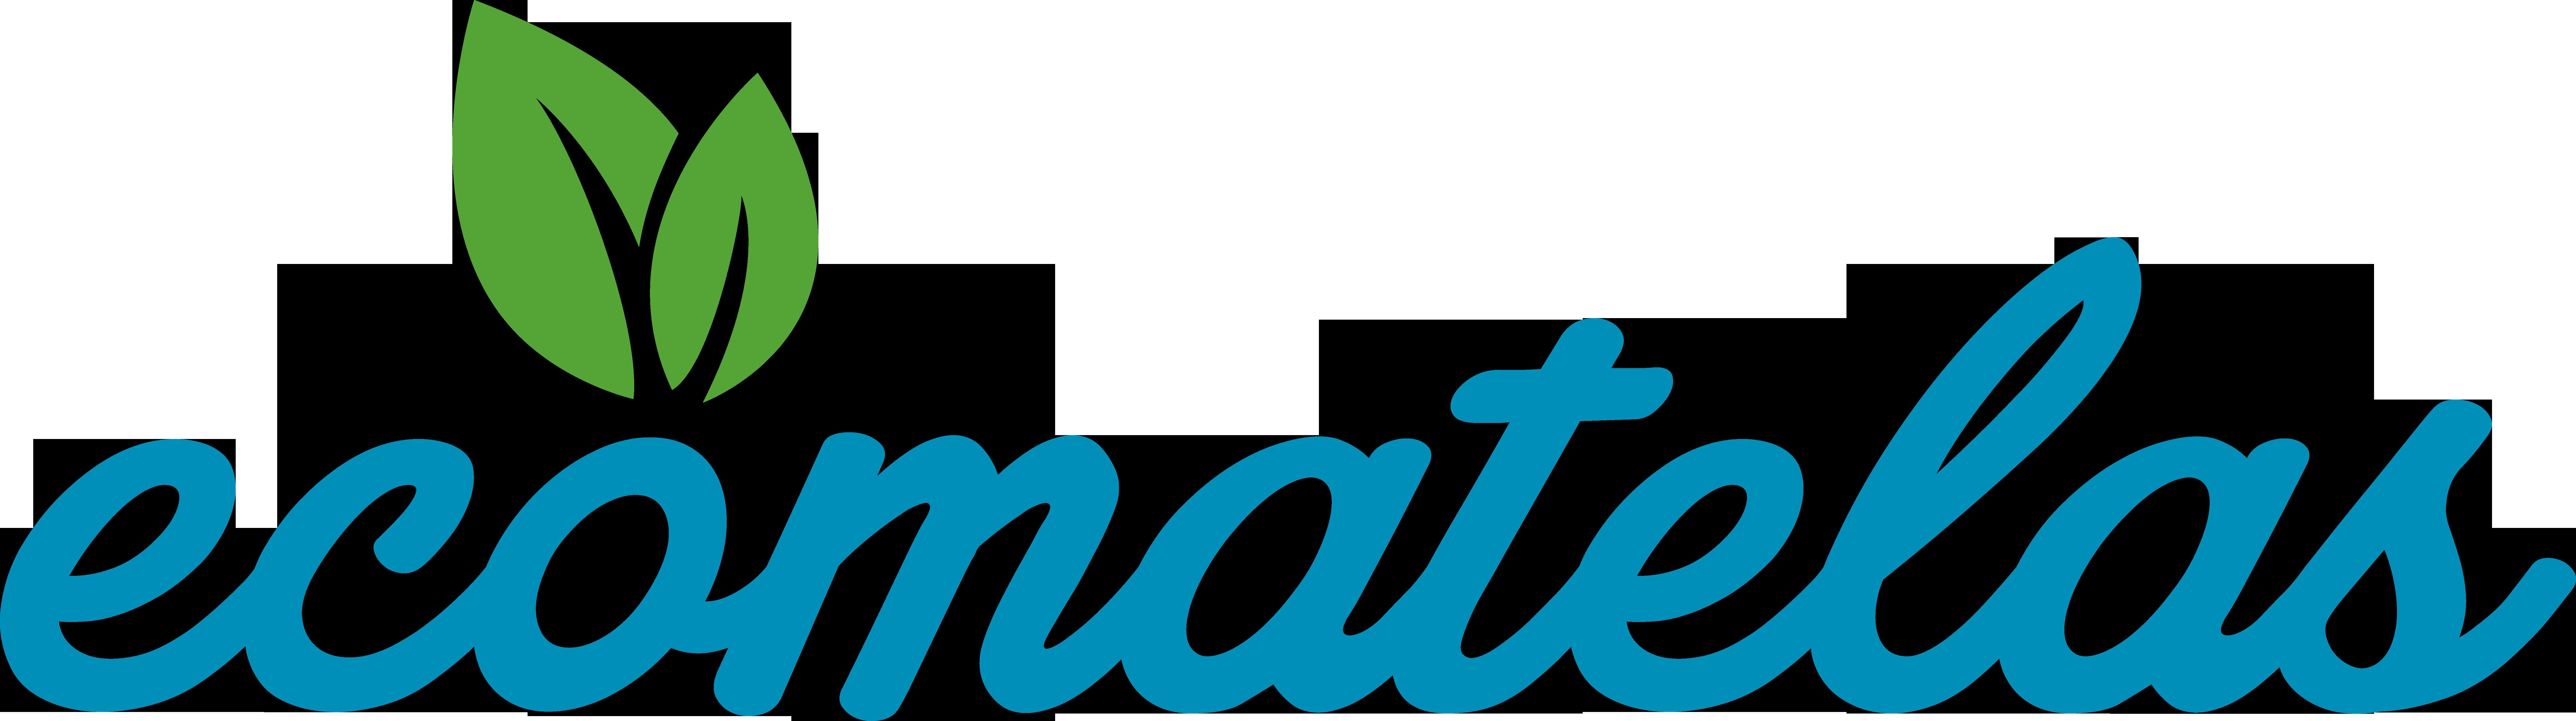 Ecomatelas EnVol